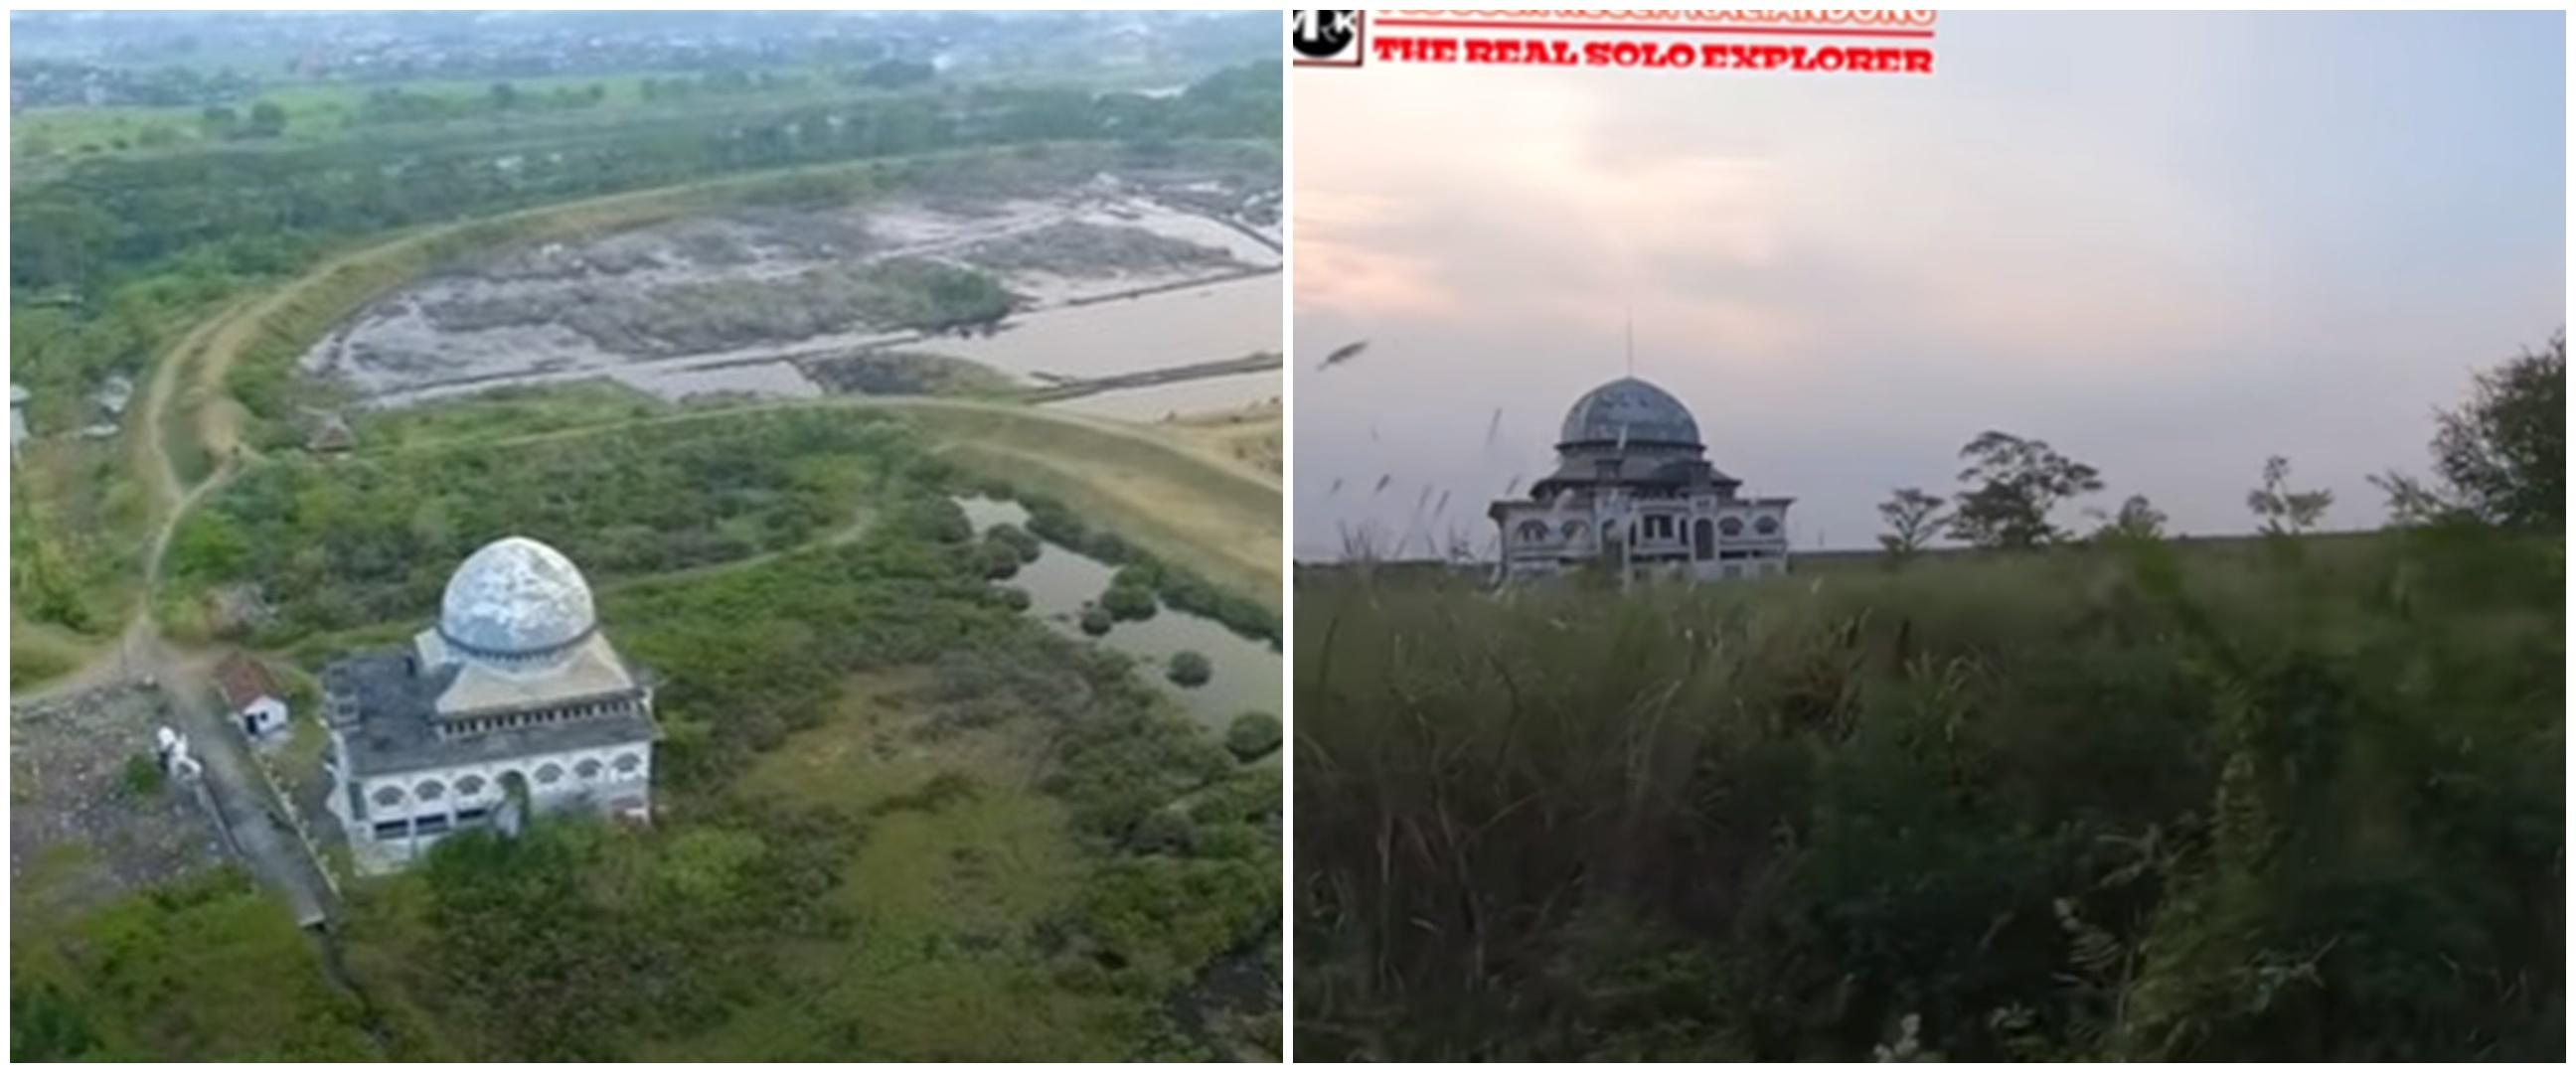 5 Potret masjid tetap kokoh meski terbengkalai akibat lumpur Lapindo